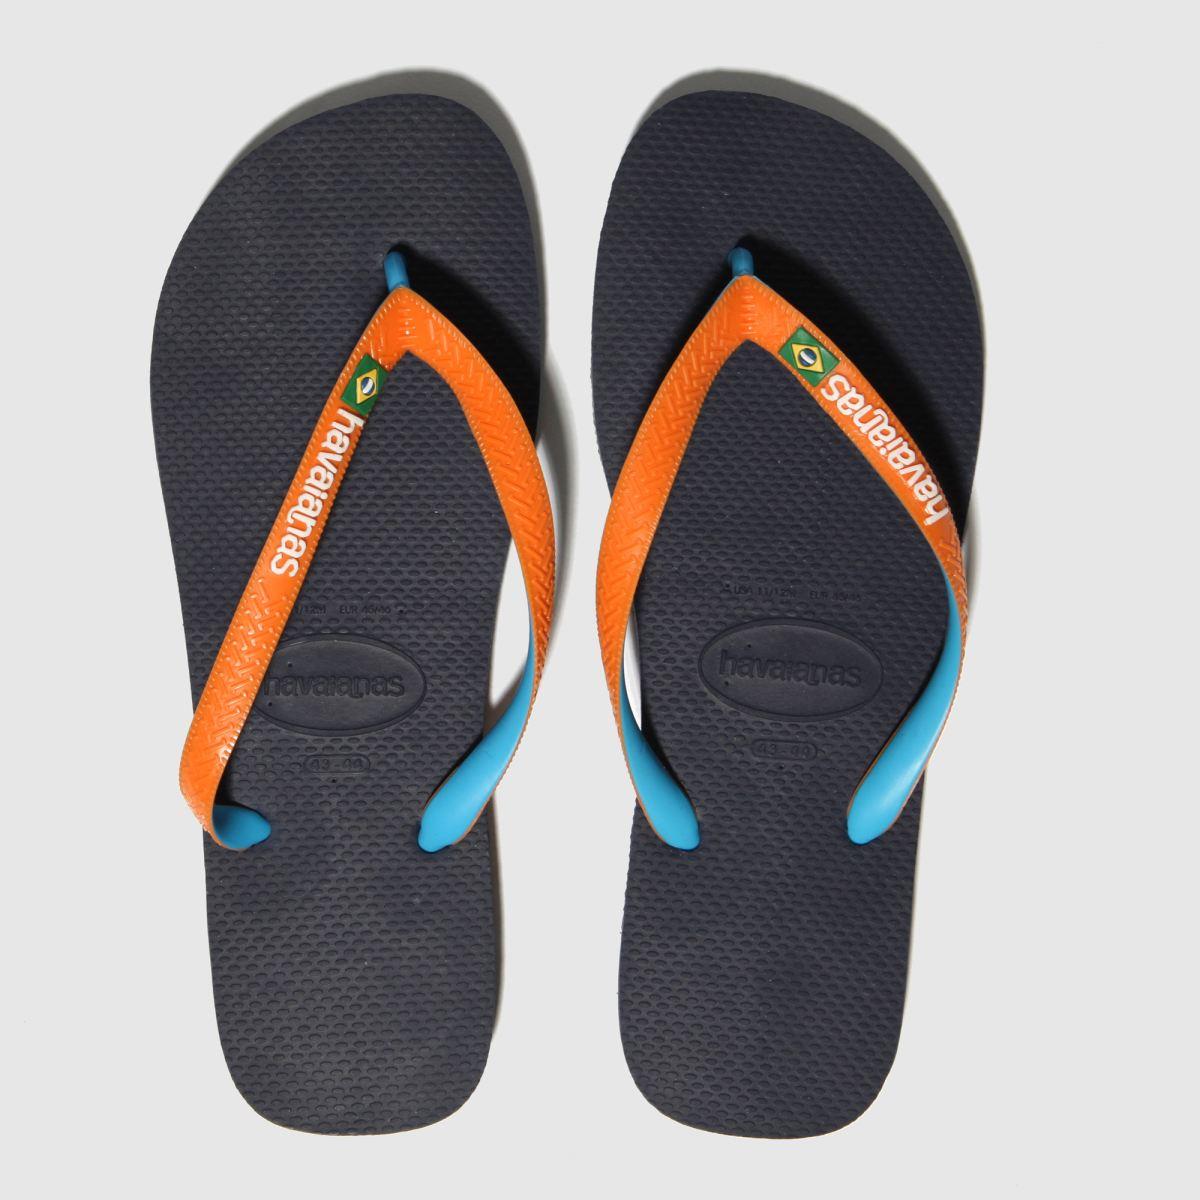 Havaianas Navy & Orange Brasil Mix Sandals